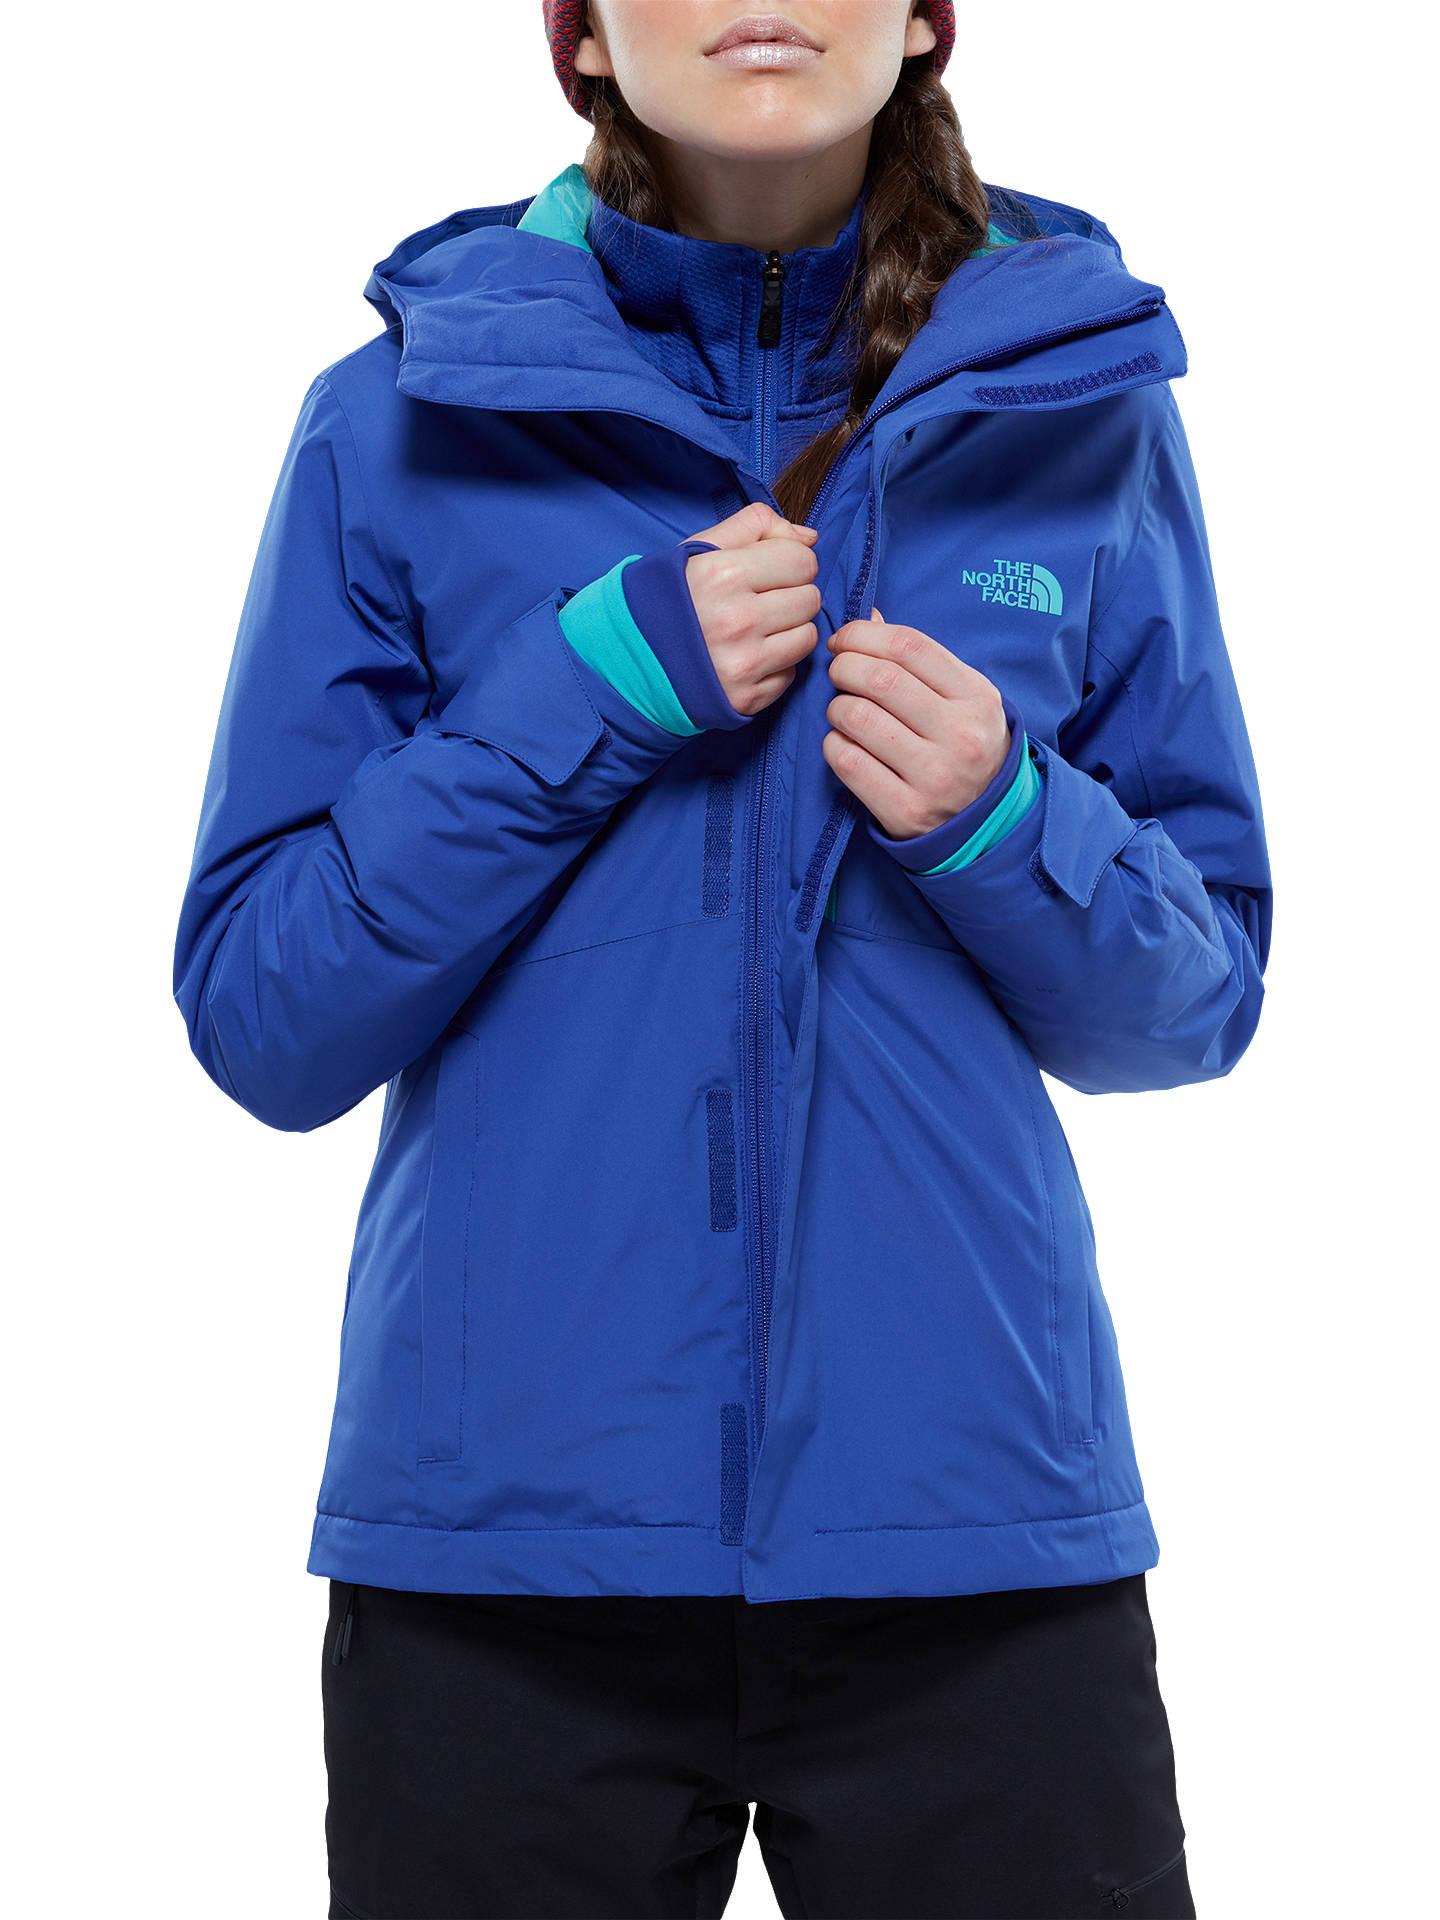 6d2dc5d1bc288 ... Buy The North Face Descendit Waterproof Women's Ski Jacket, Blue, S  Online at johnlewis